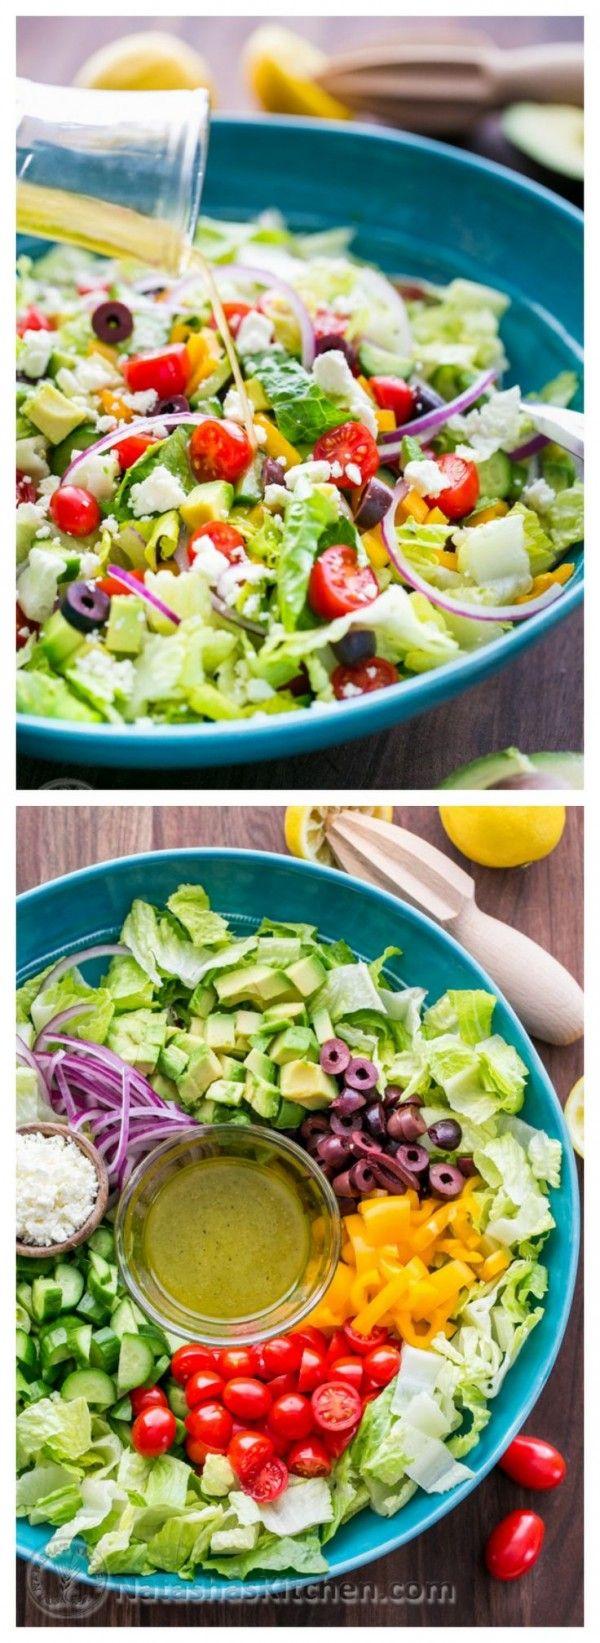 Greek Salad with Zesty Lemon Dressing from Natasha's Kitchen~ Sensational Summer Salads|Craving Something Healthy @natashaskitchen